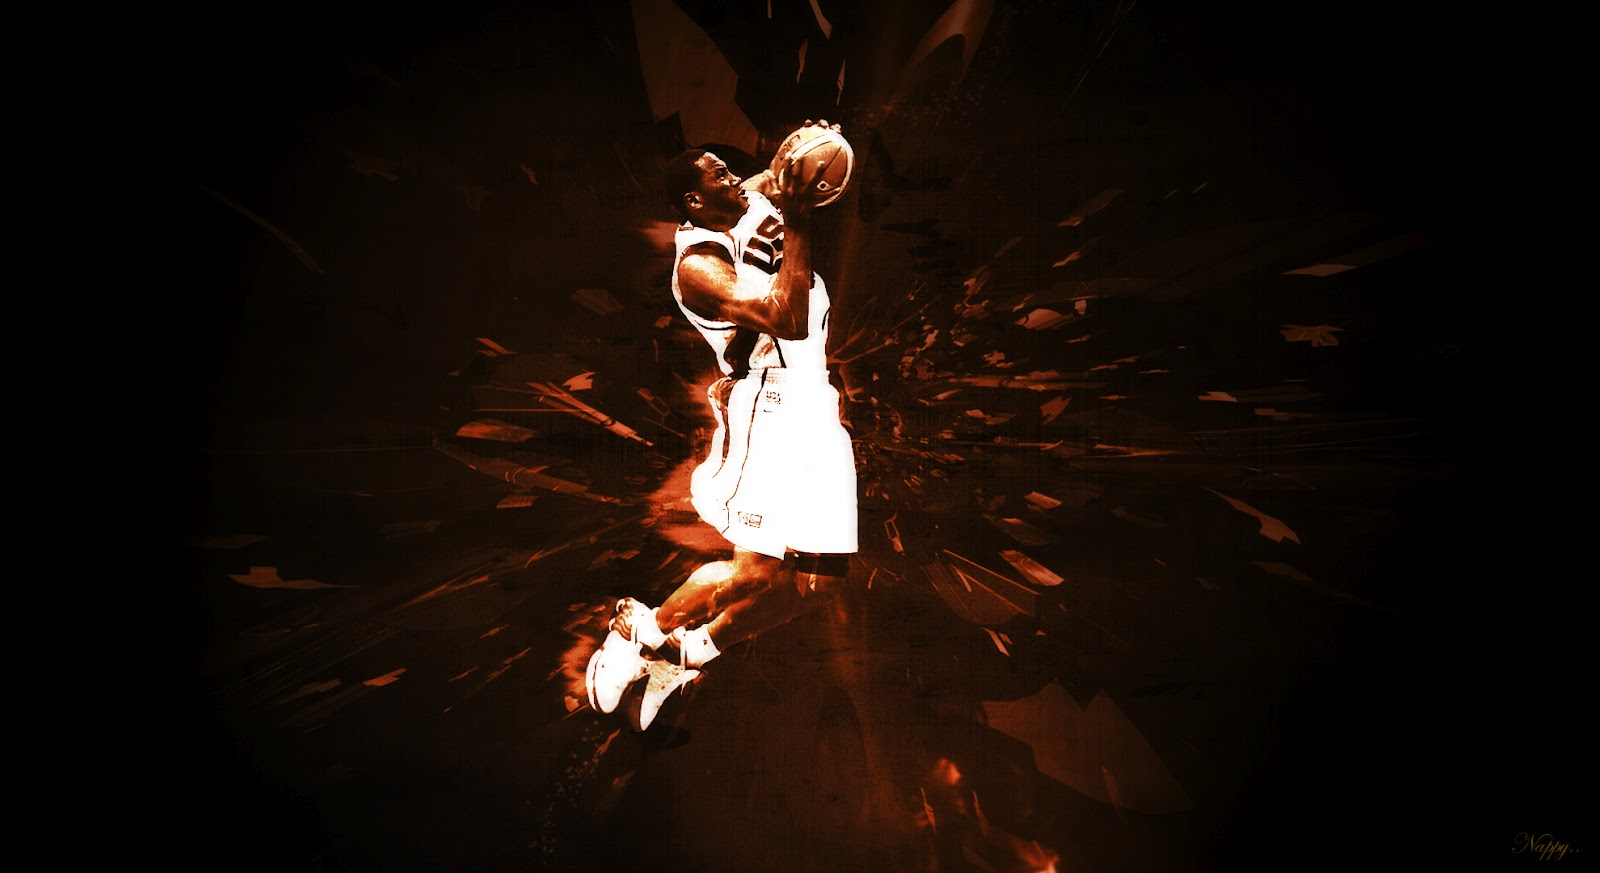 Basketball Wallpapers HD | Nice Wallpapers